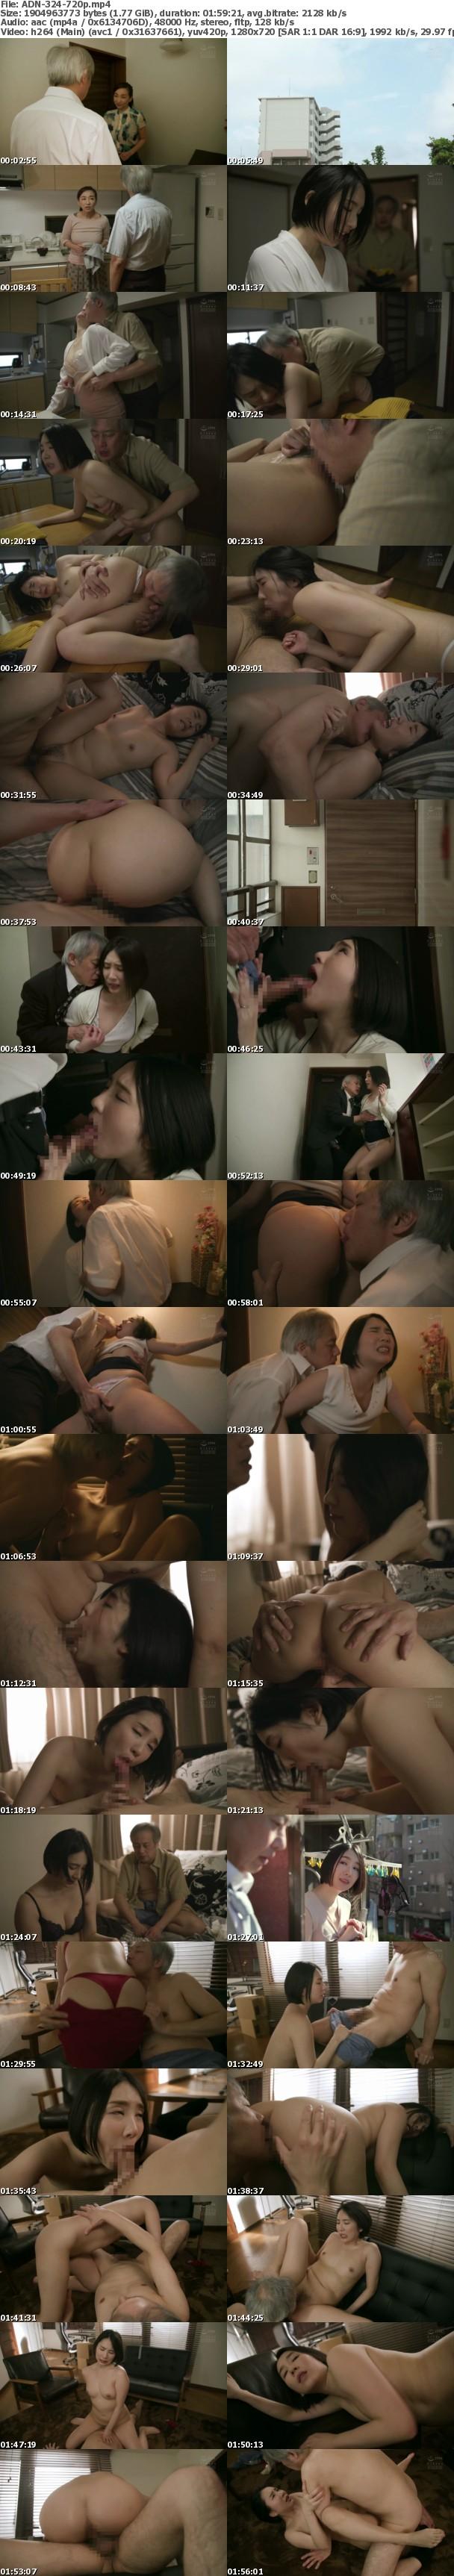 (HD) ADN-324 秘蜜の愛人 泥沼のように溺れた不貞性交 舞原聖